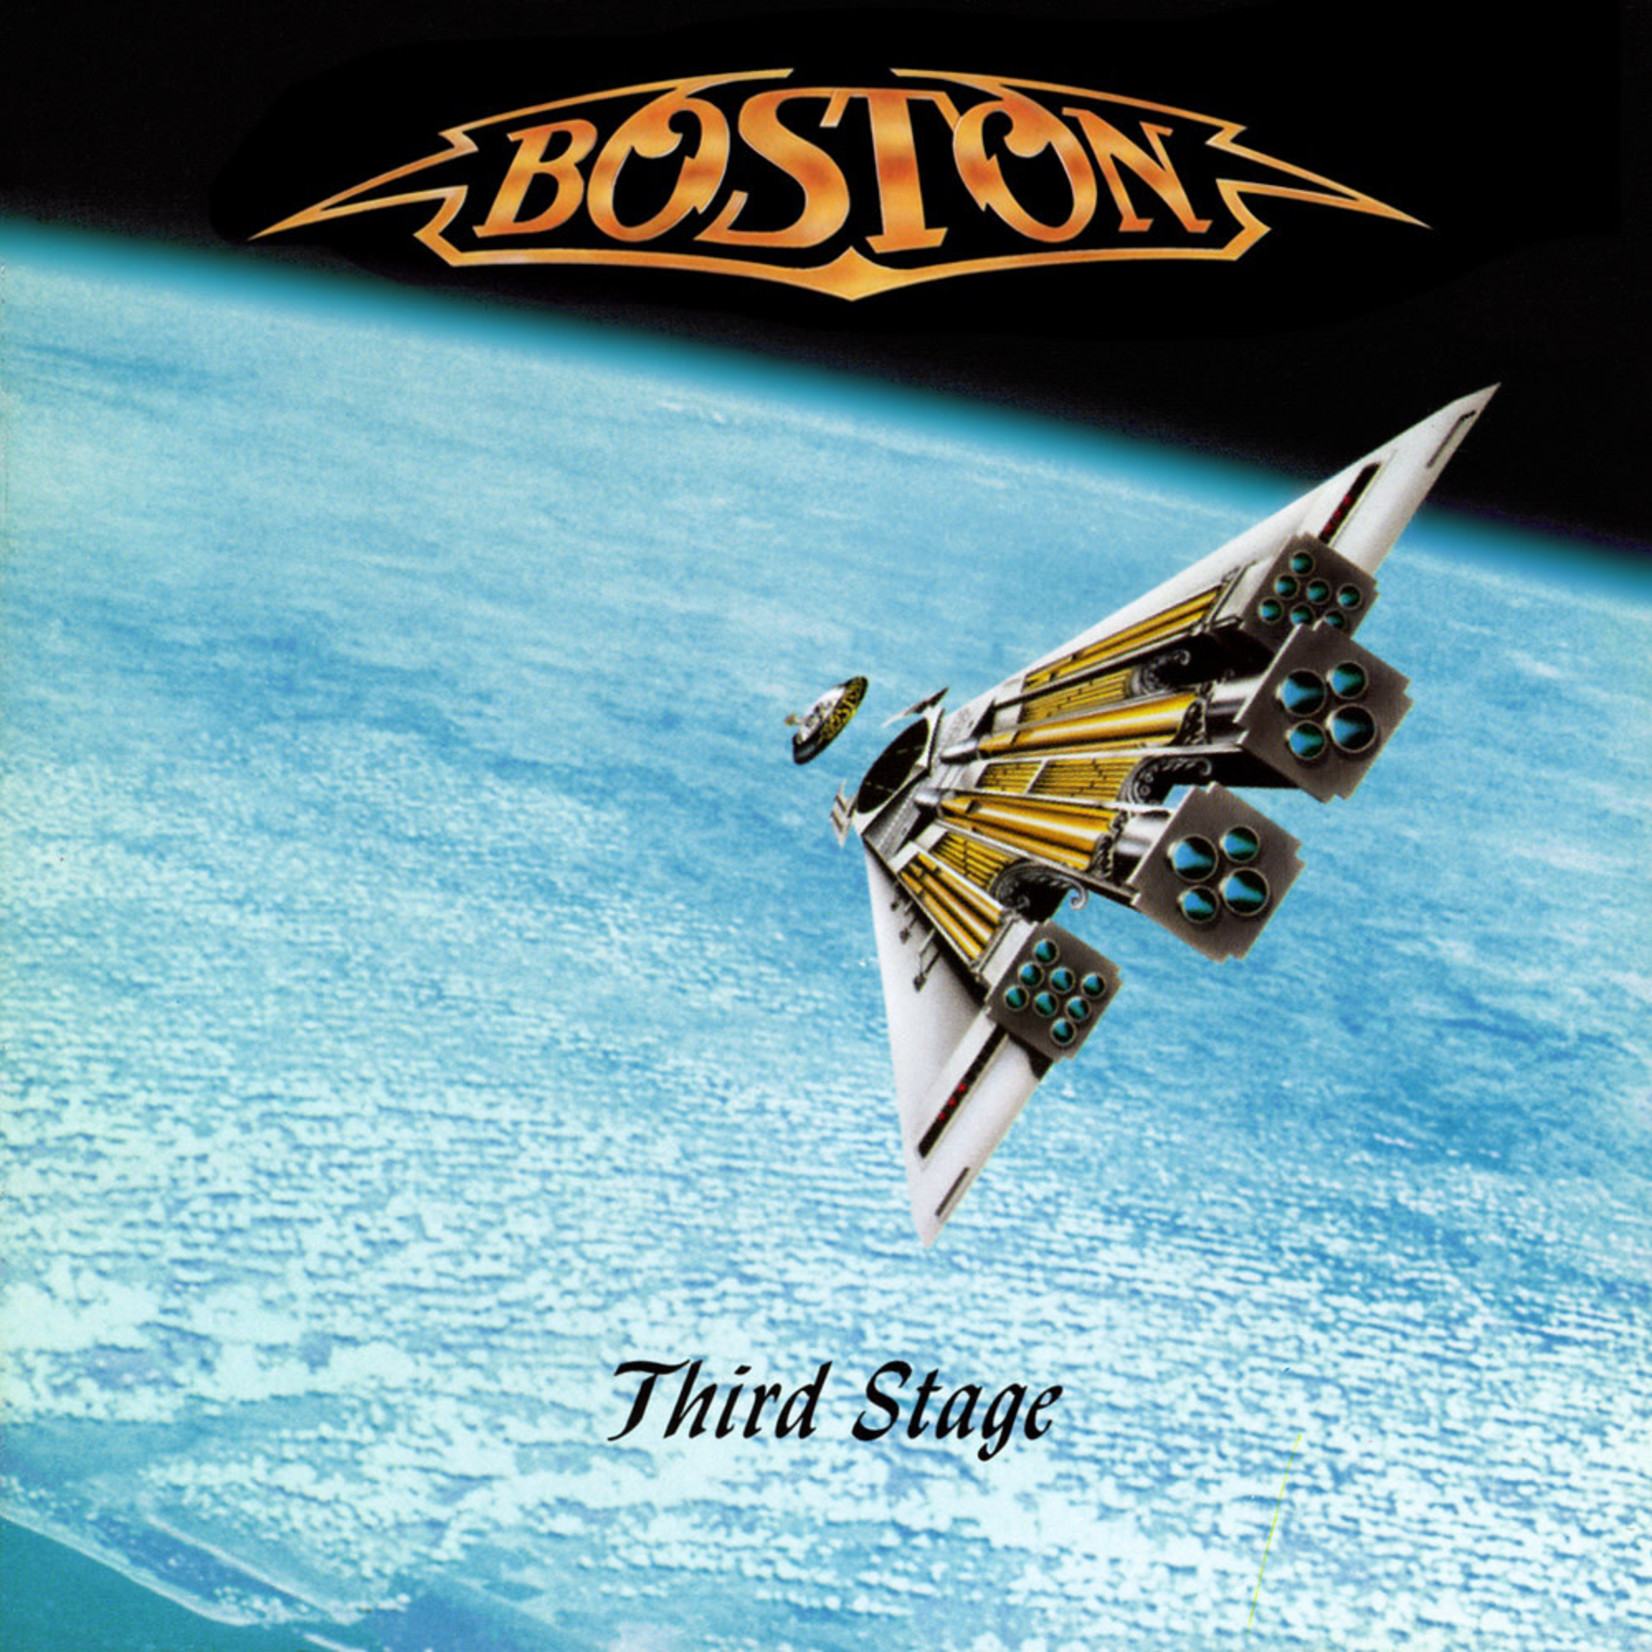 [Vintage] Boston: Third Stage